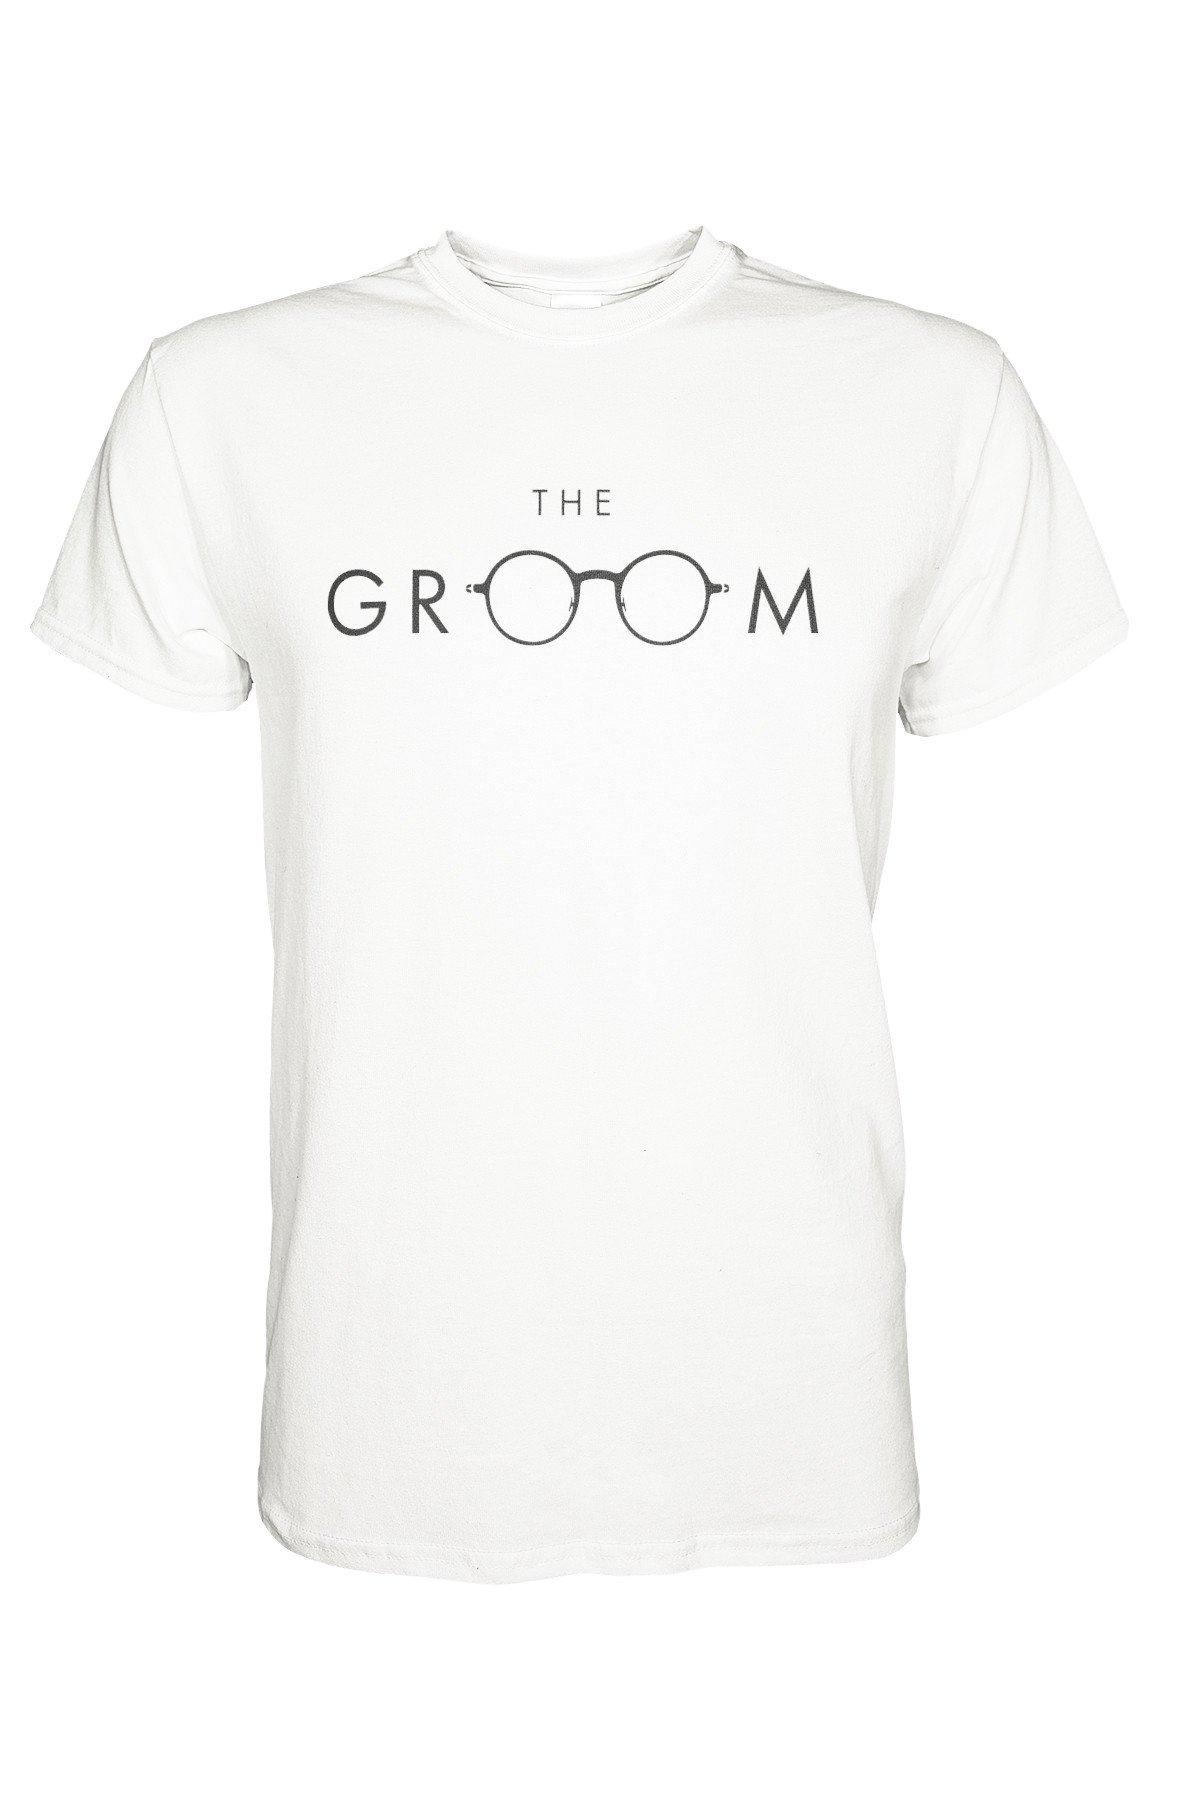 The Groom (glasses)